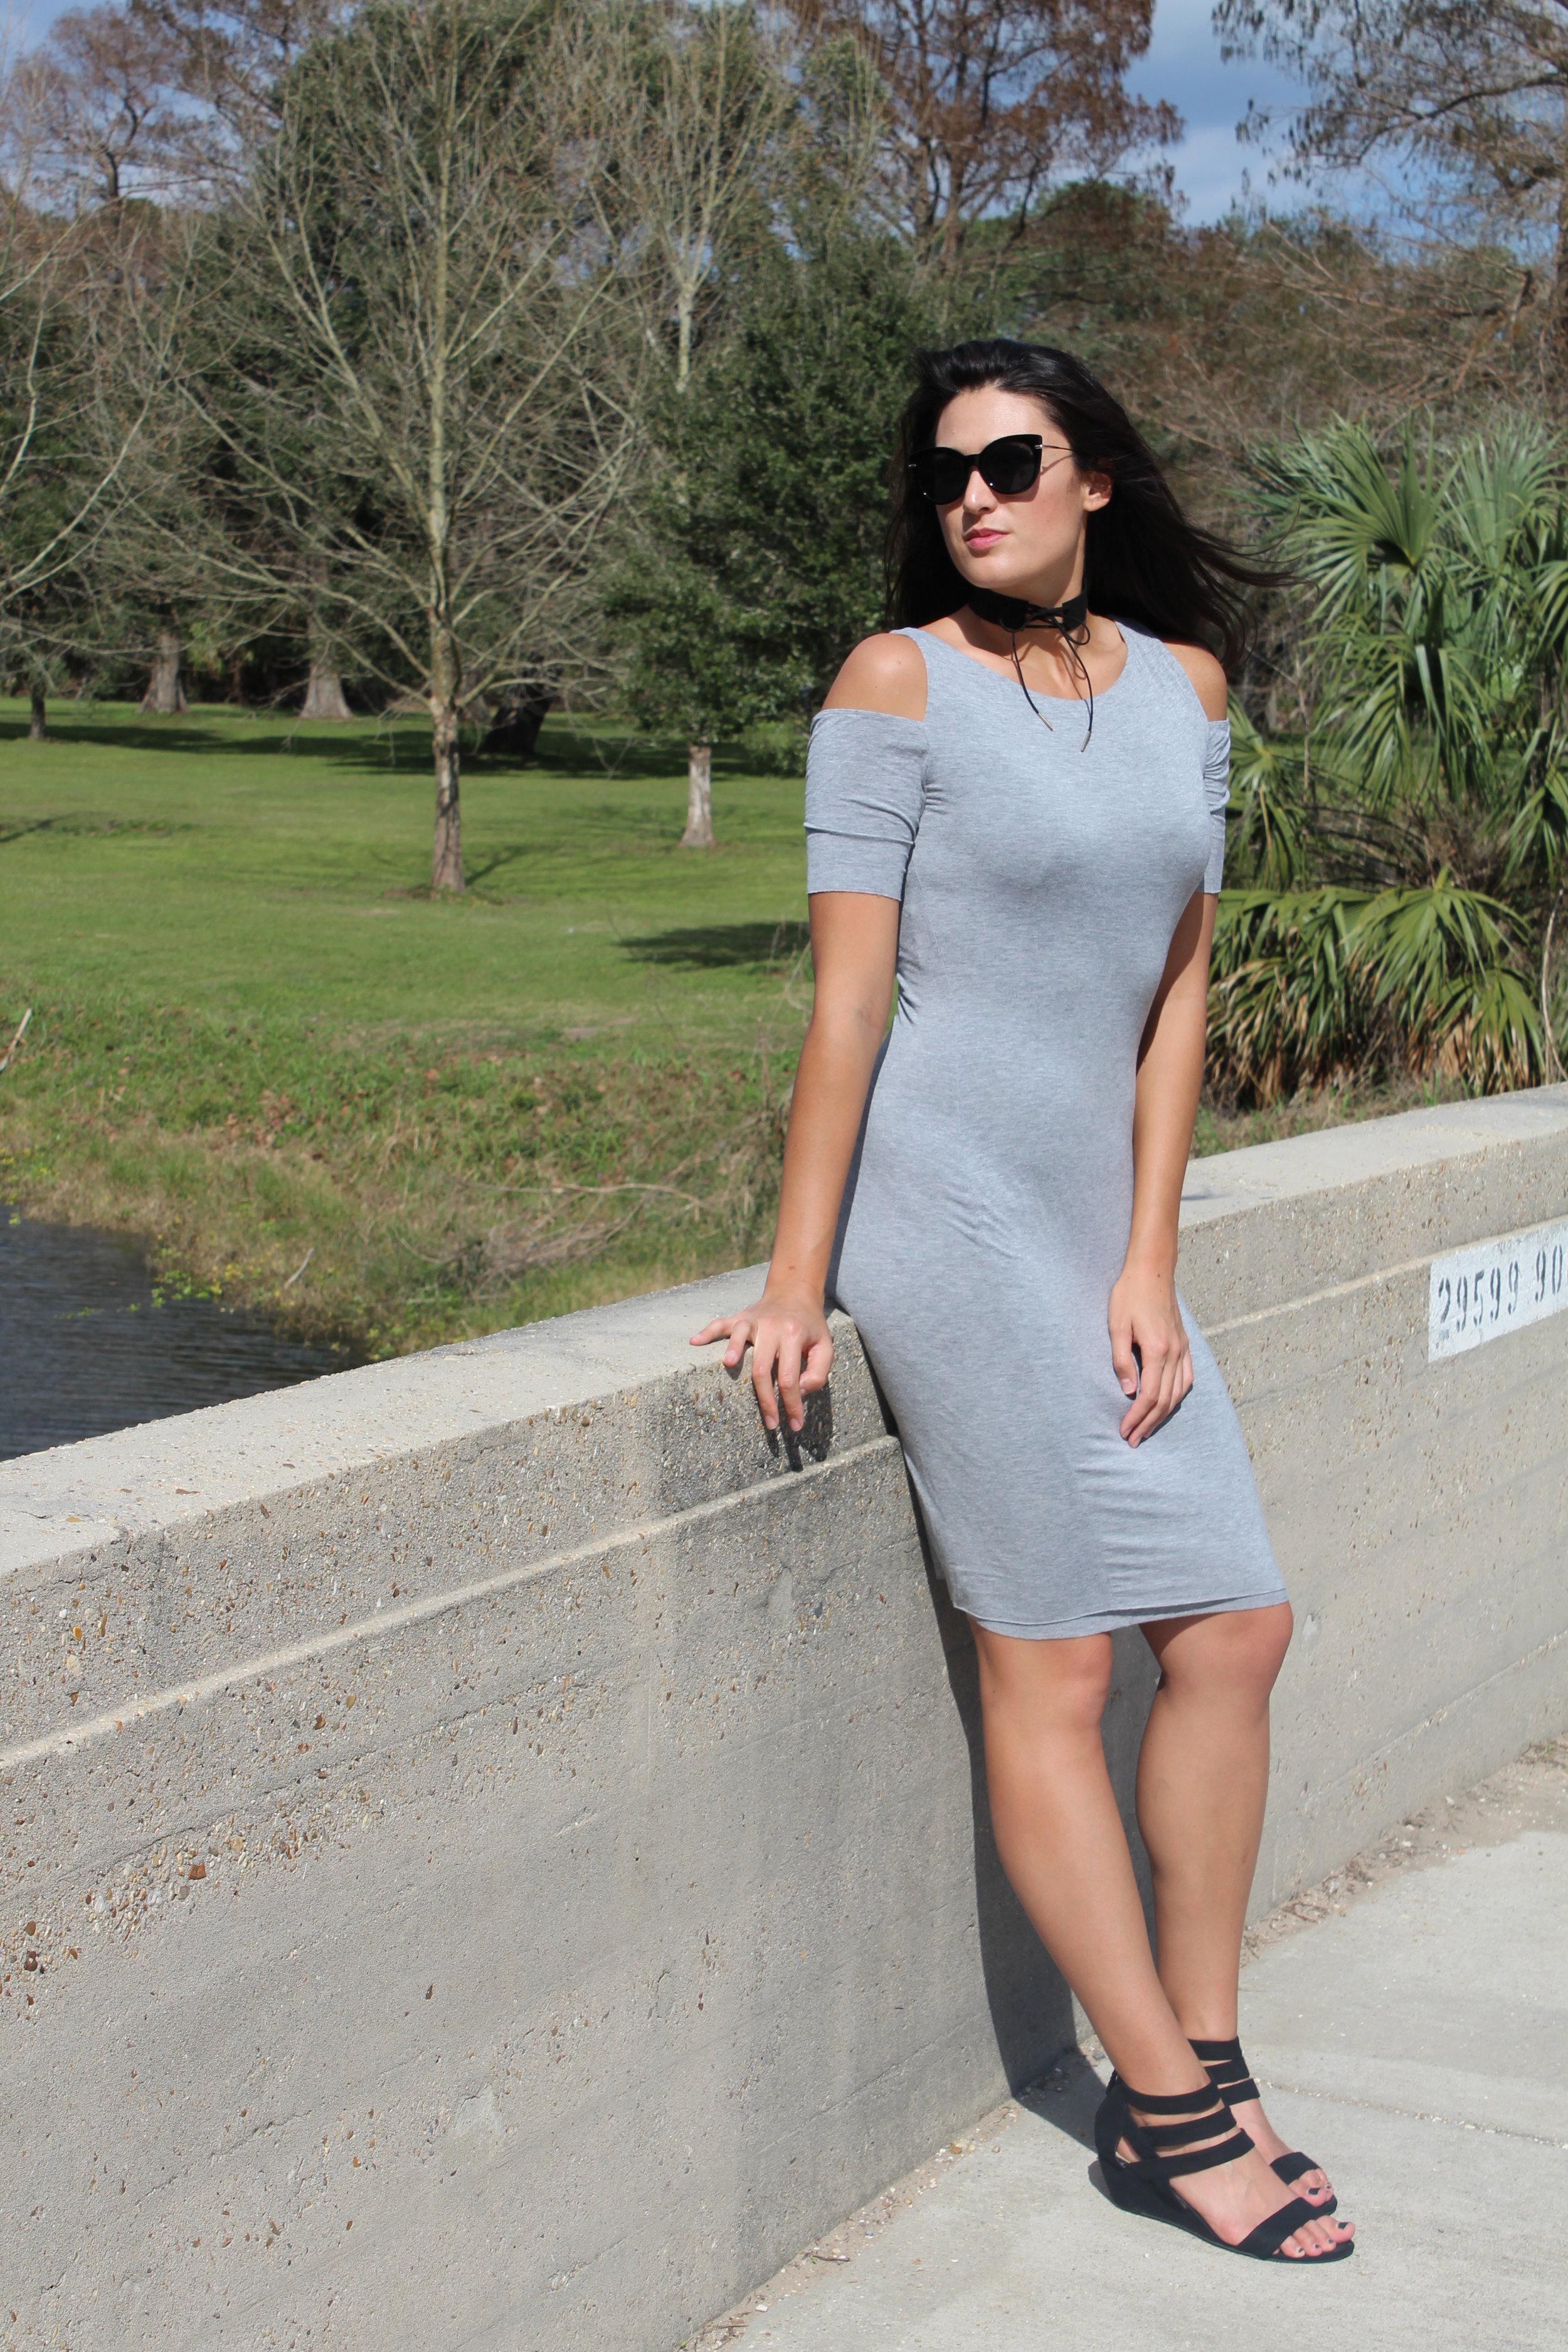 Le Tote - Bailey 44, Cold Shoulder Knit Dress $104